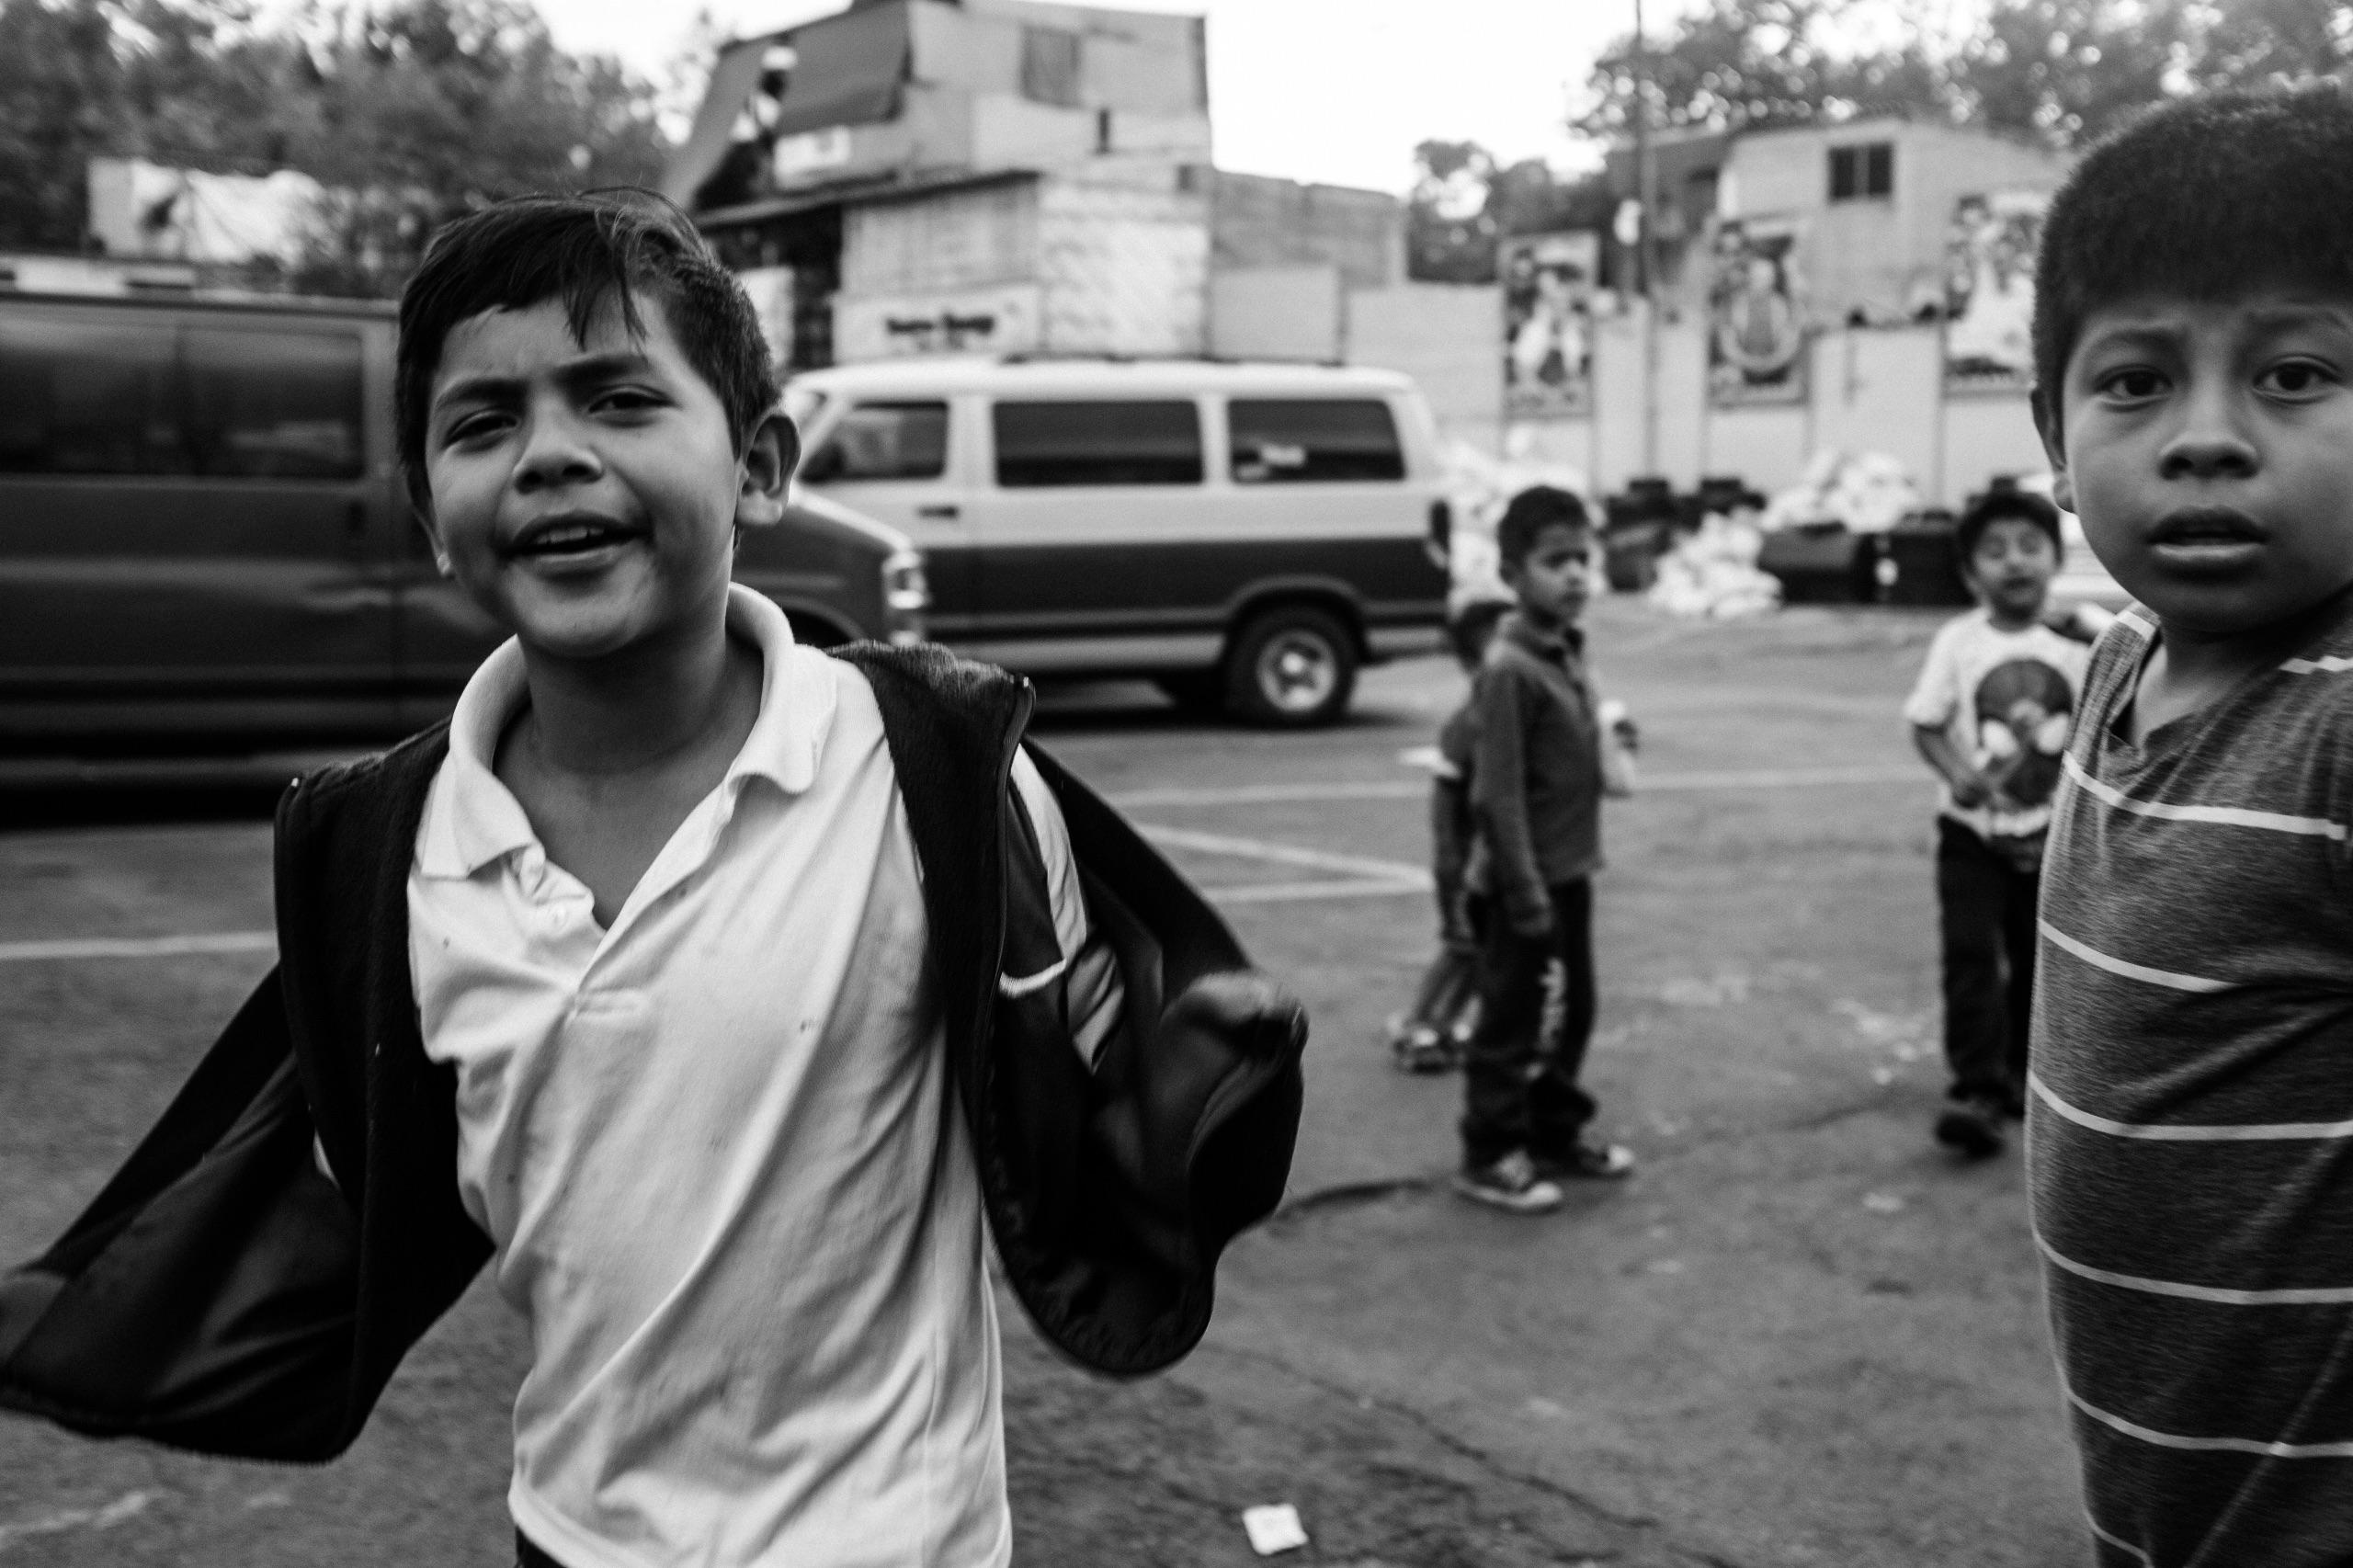 Mexico City Street Kids. Web: I - trovatten | ello